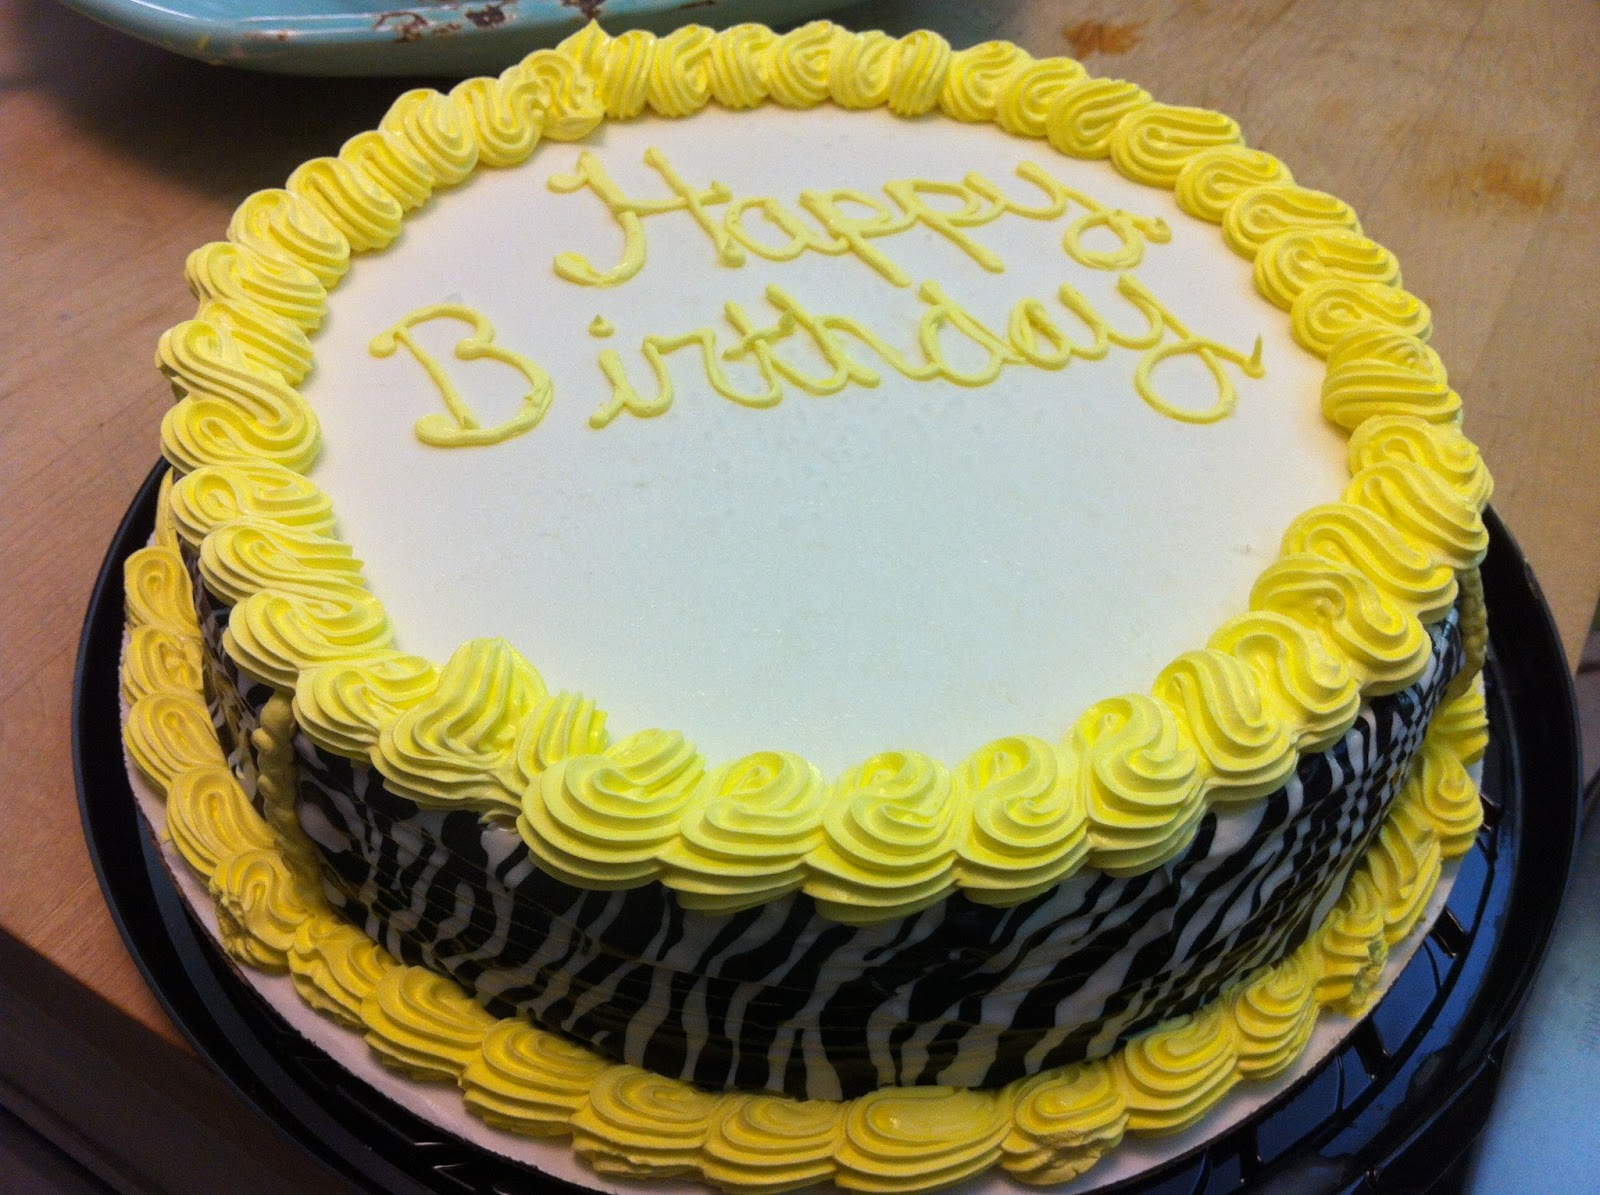 Zebra Cake Recipe Joy Of Baking: Lovin' Much!: Celebrating Caroline Faith